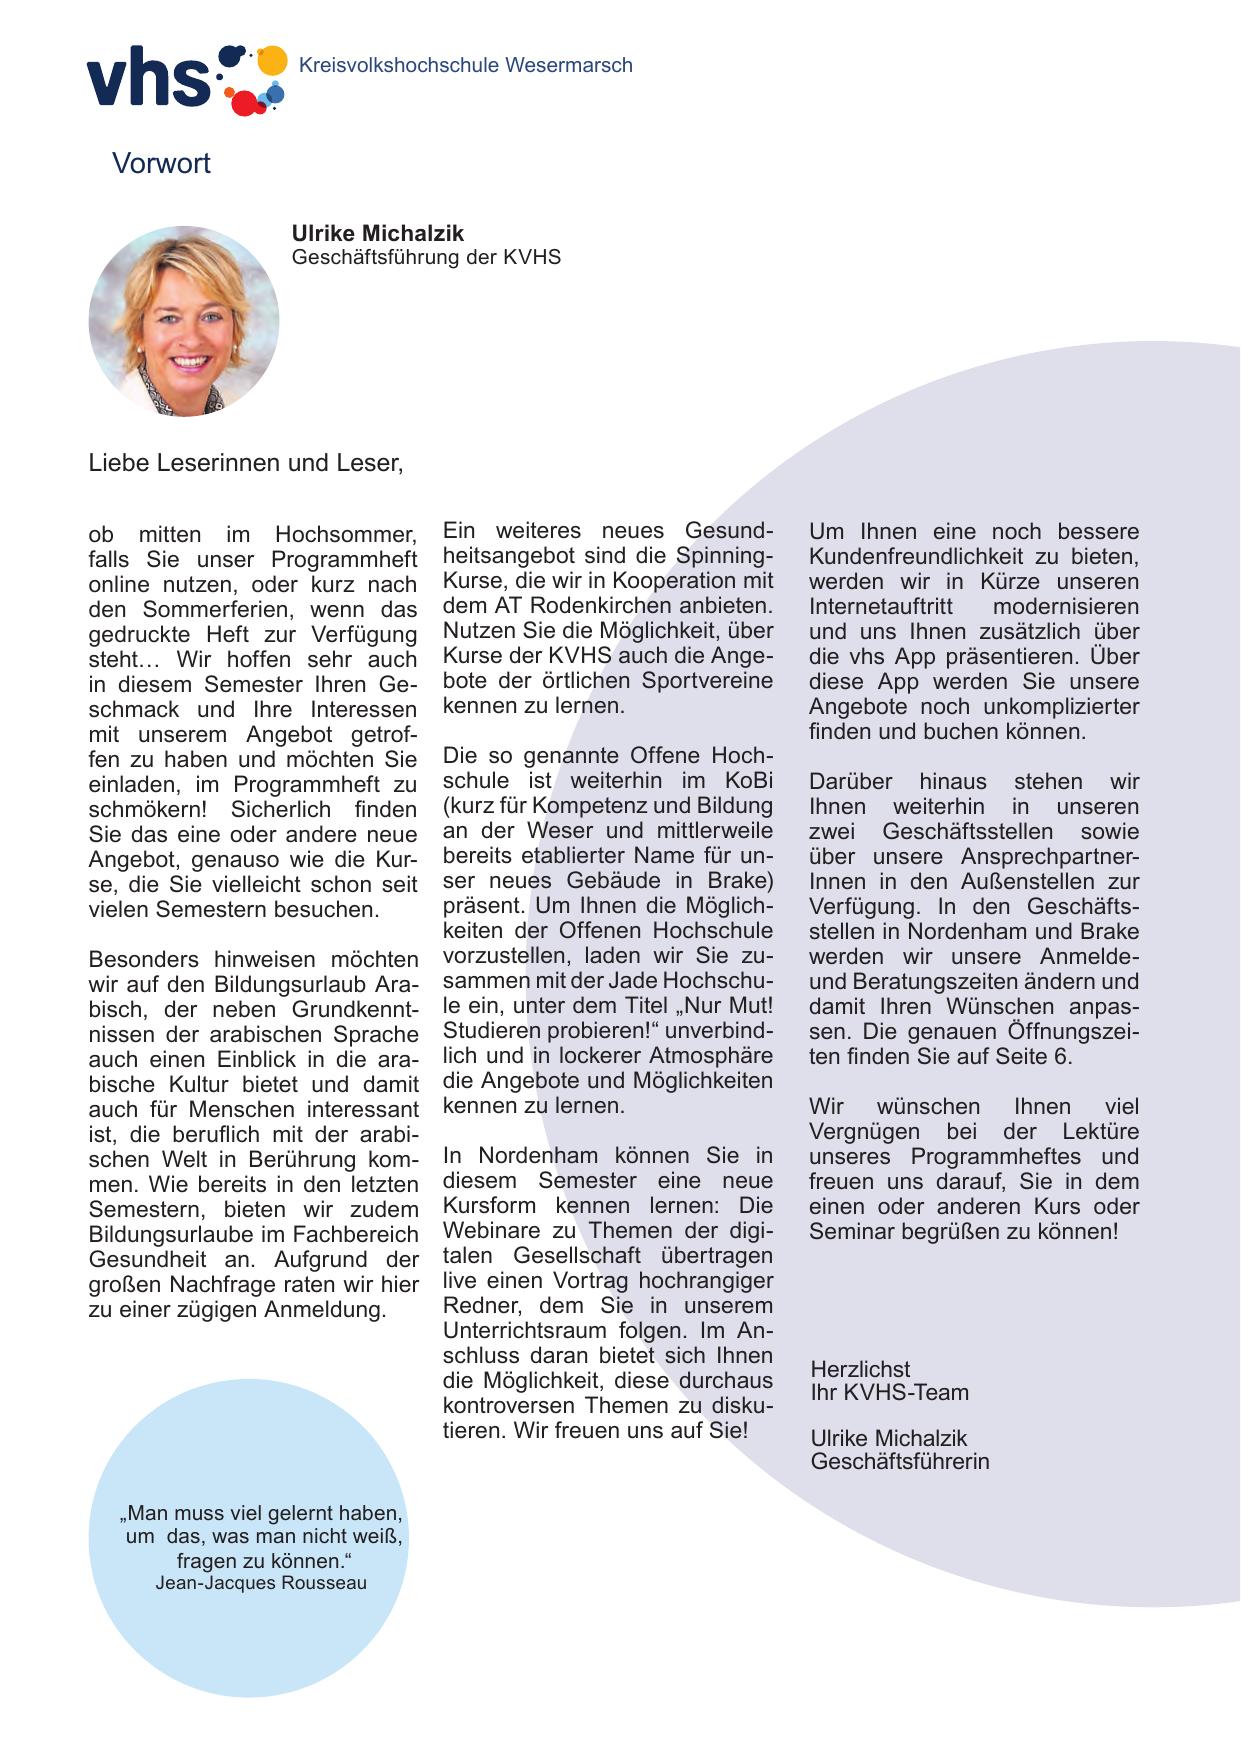 KVHS-Programmheft Herbstsemester 2015 | manualzz.com